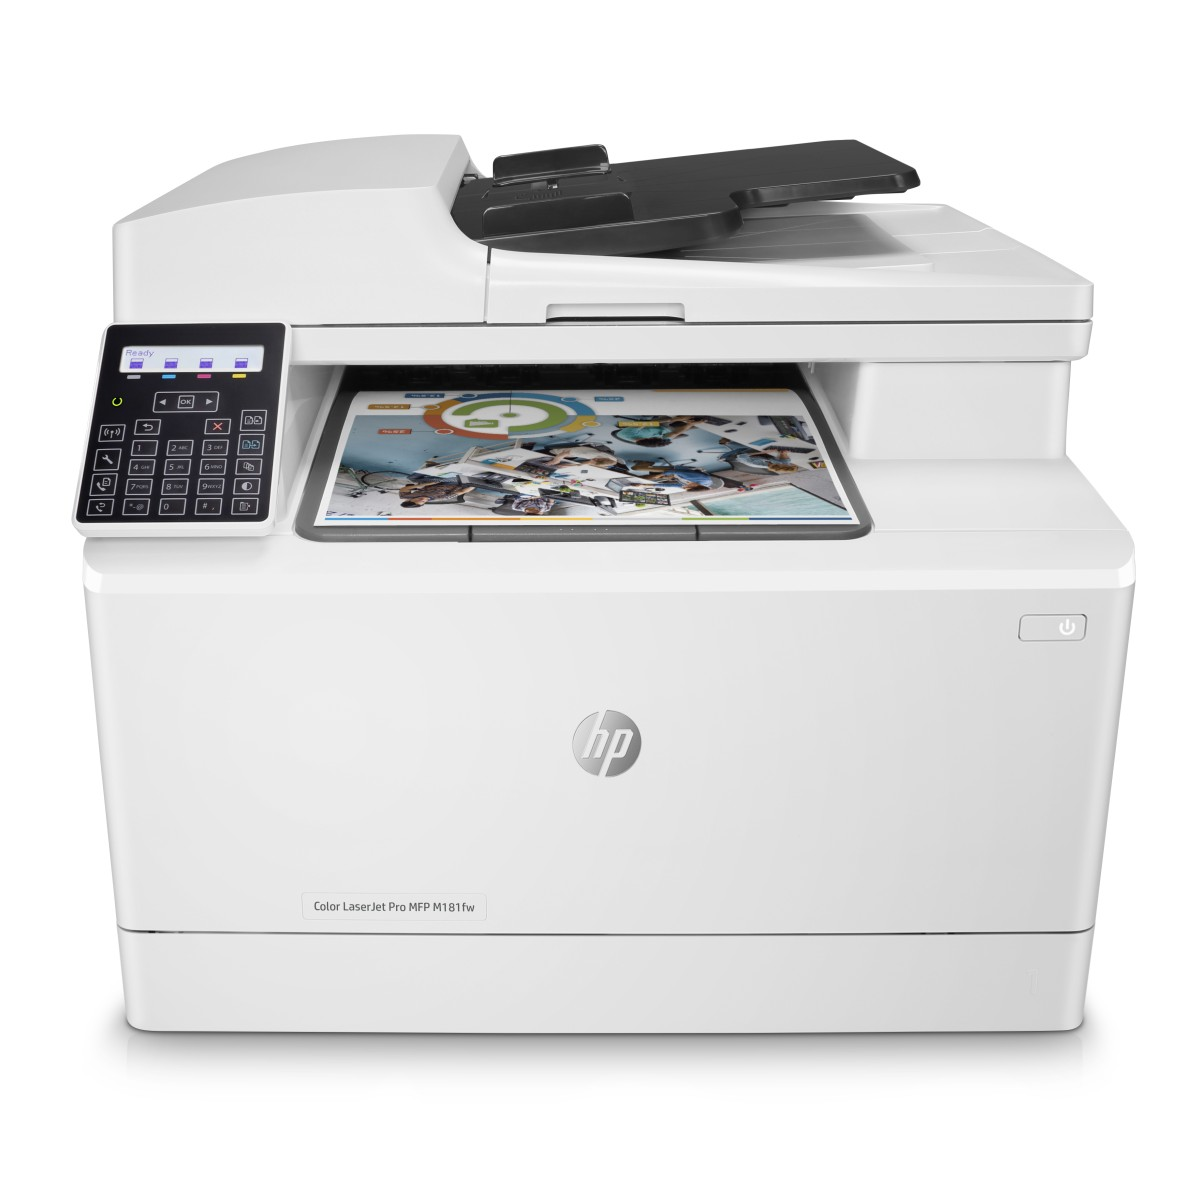 HP Color LaserJet Pro MFP M181fw (A4, 16/16 ppm, USB 2.0, Ethernet, Wi-Fi, Print/Scan/Copy, Fax)